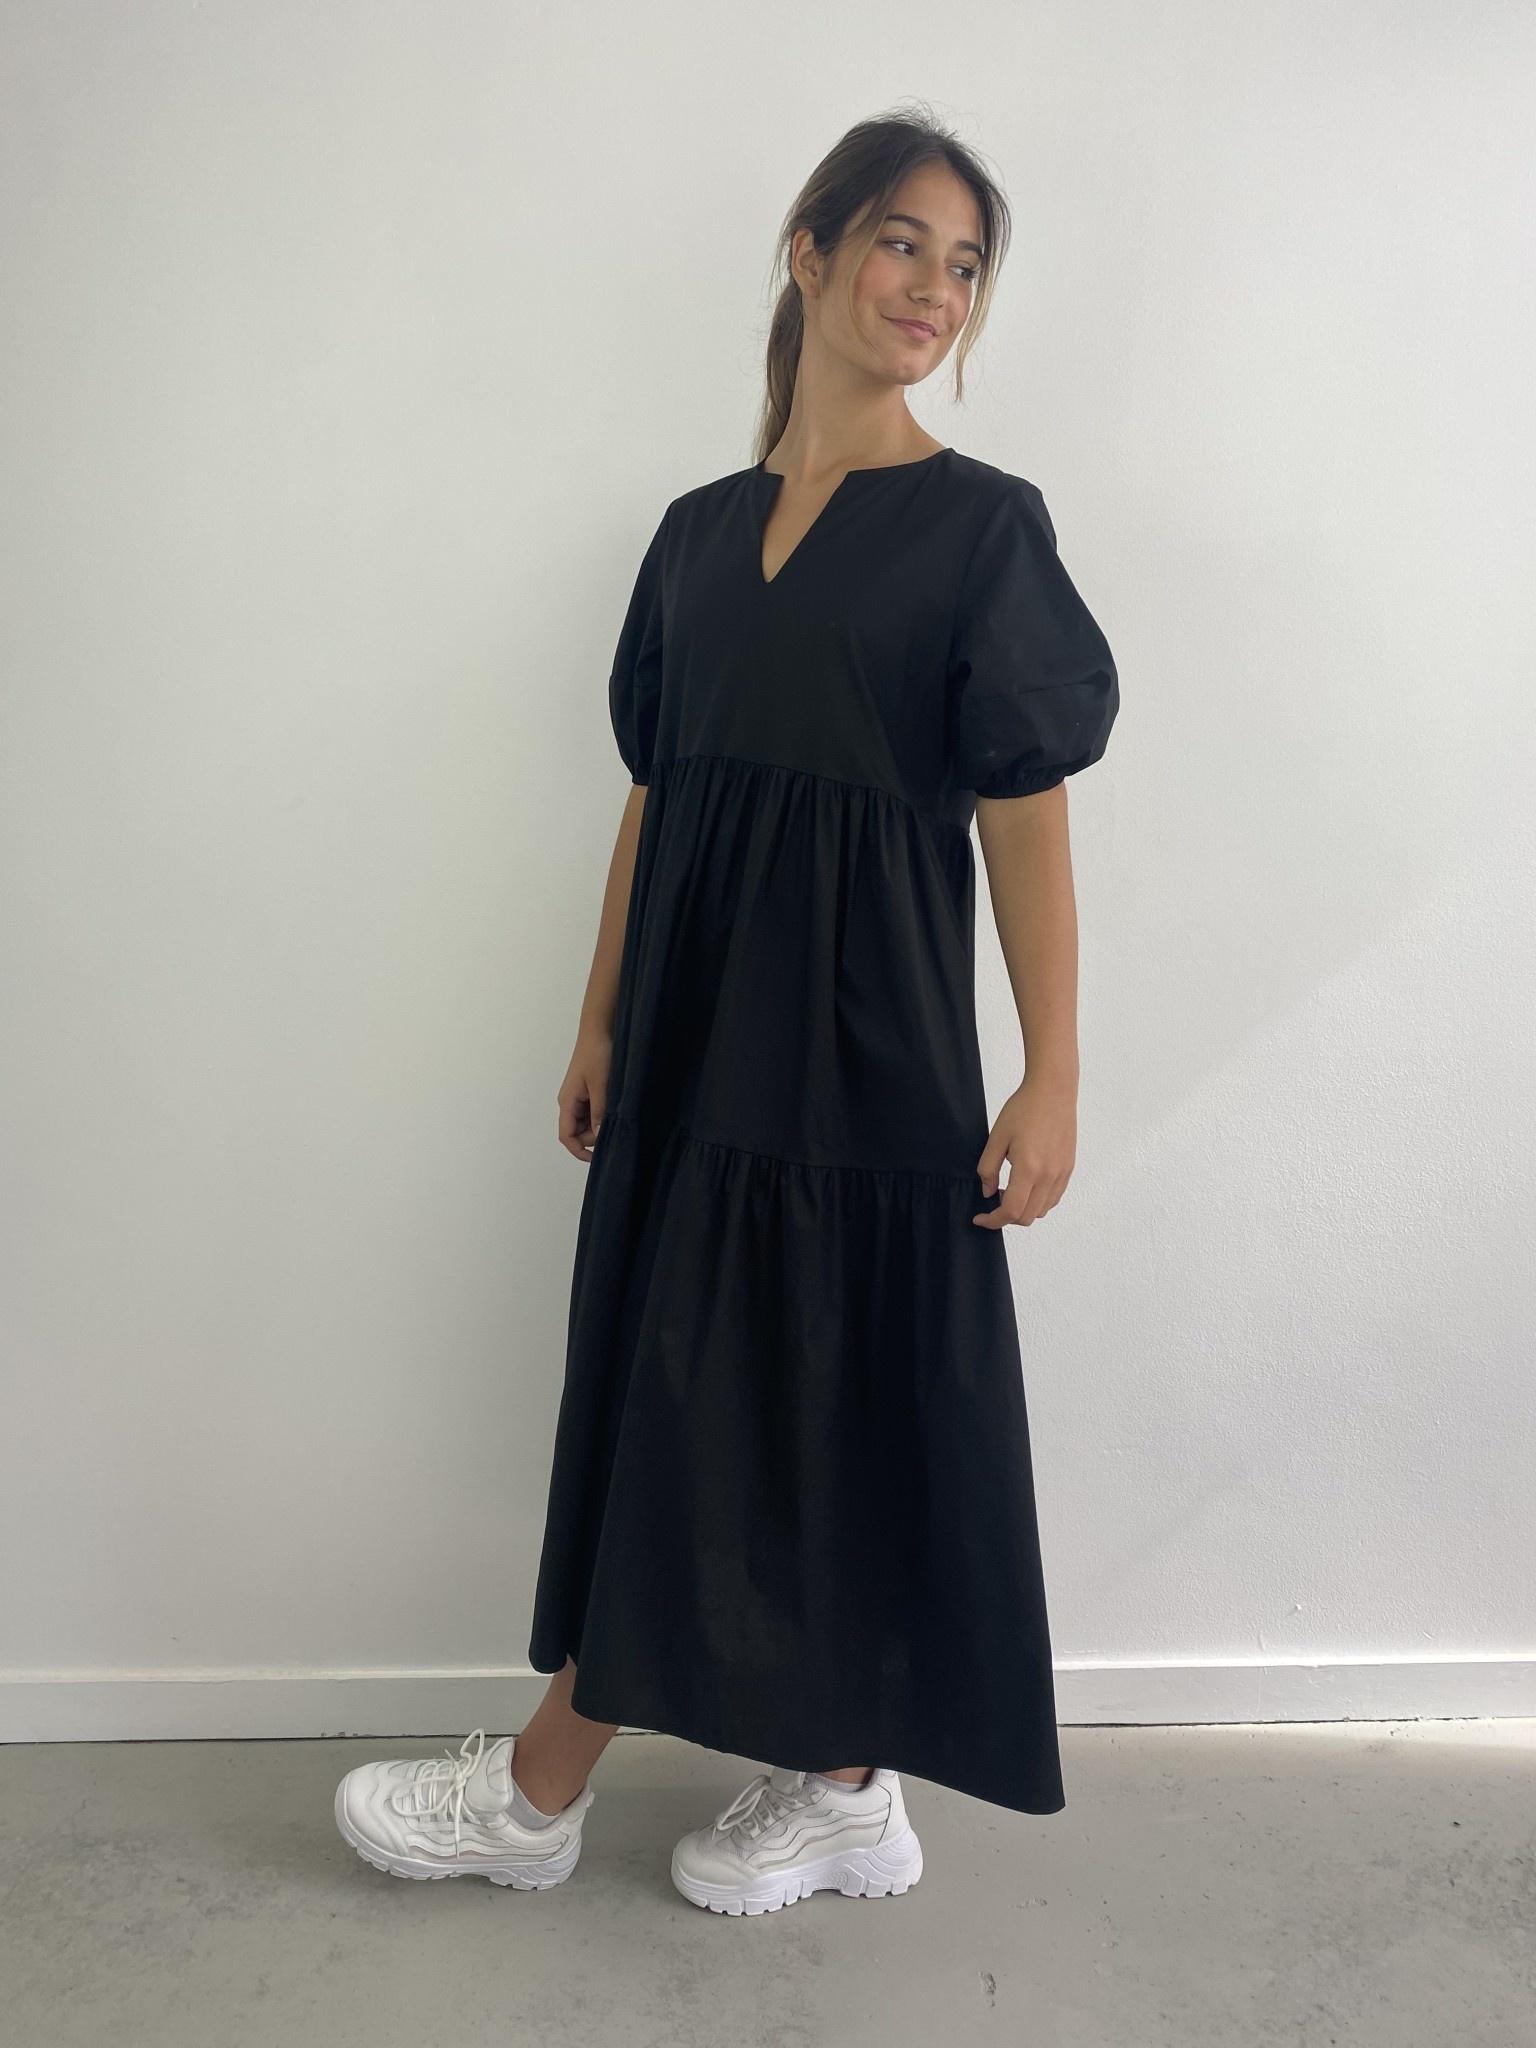 Jovie urban dress Black-1